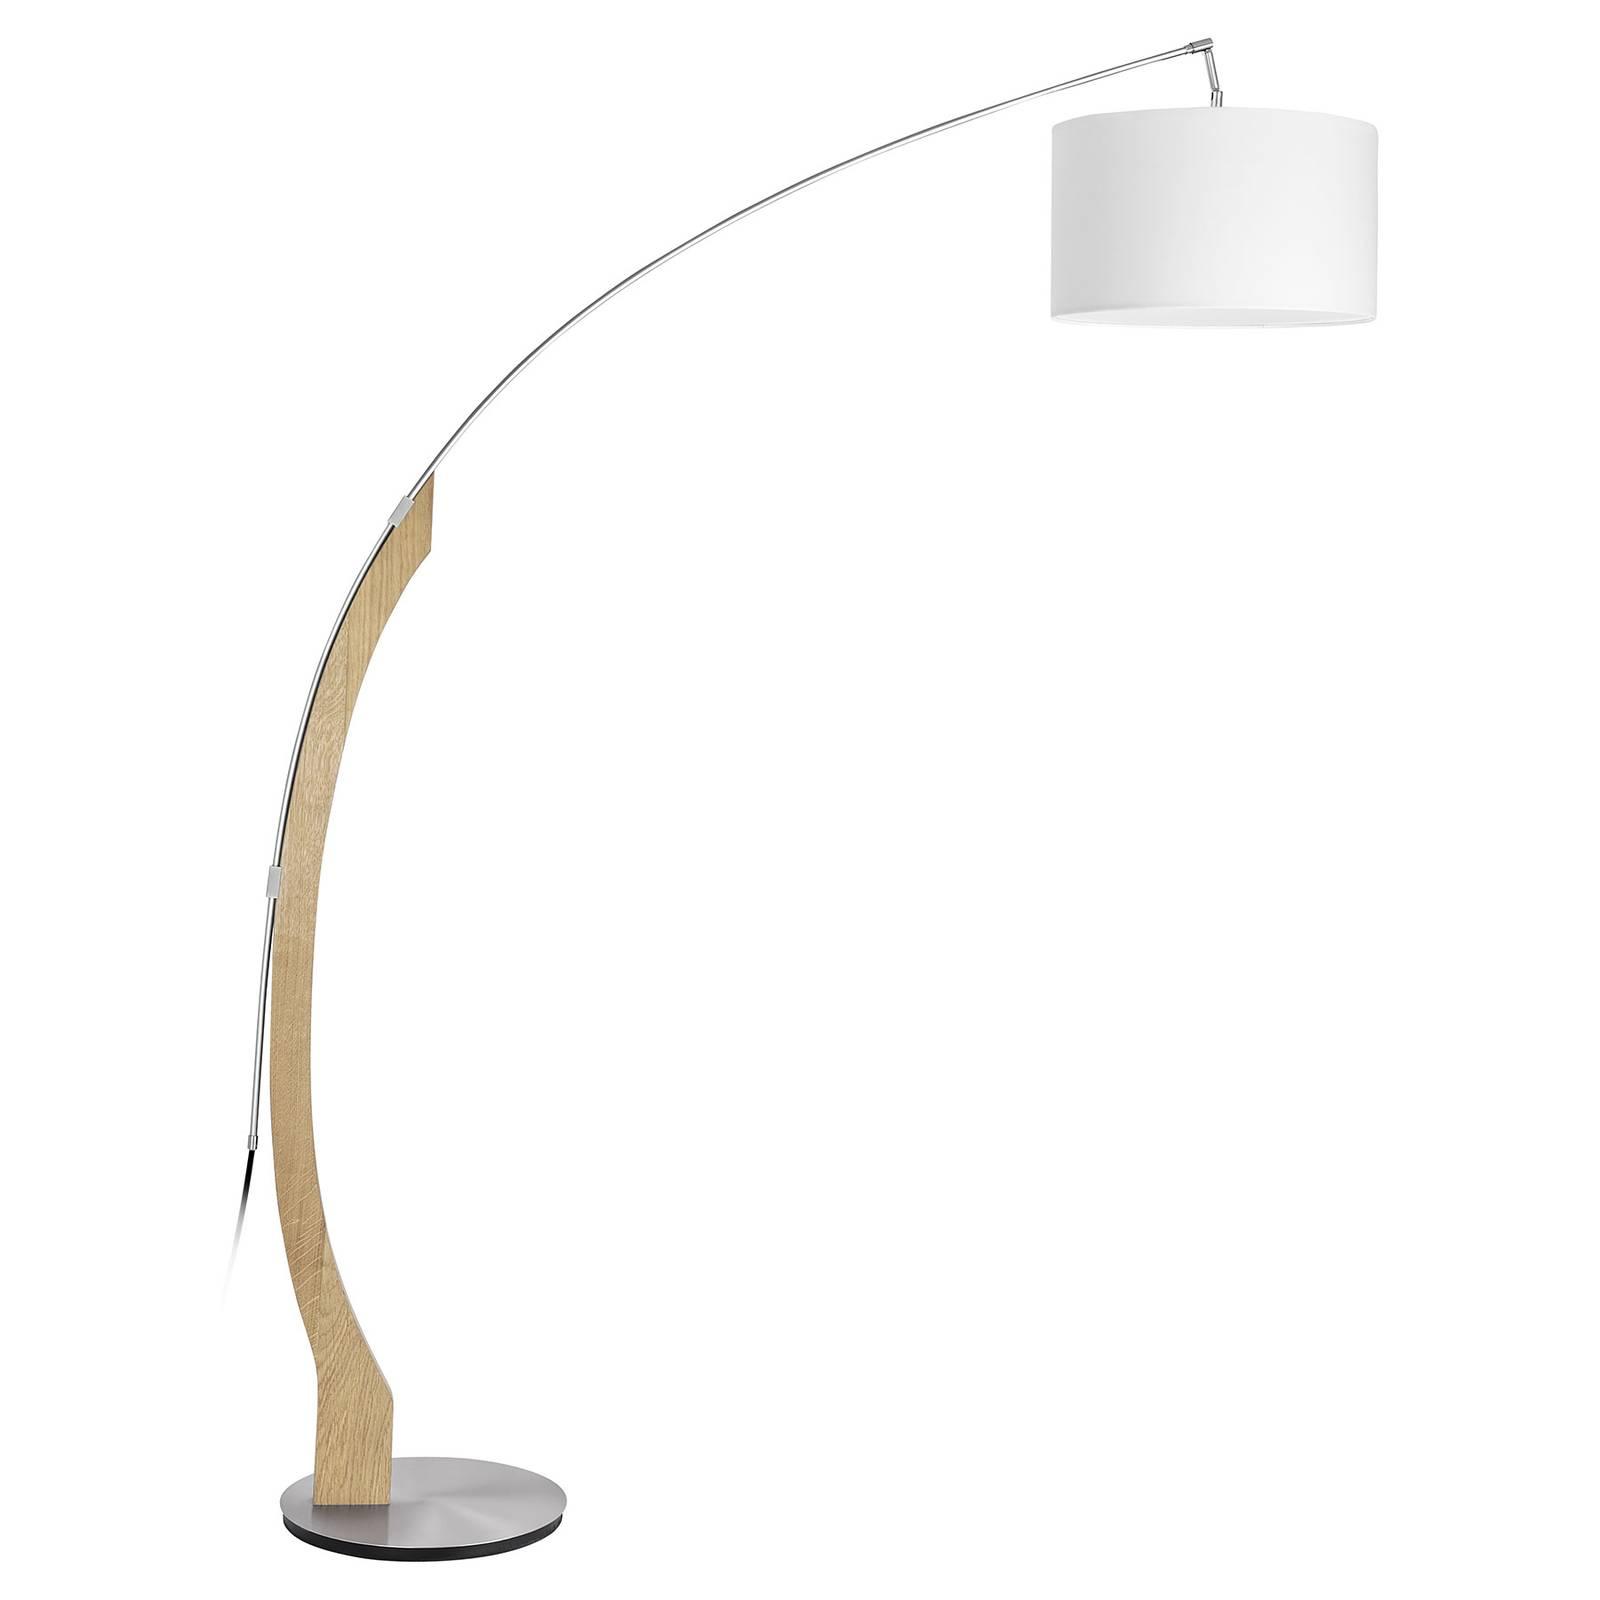 HerzBlut Amos lampadaire arqué, chêne naturel